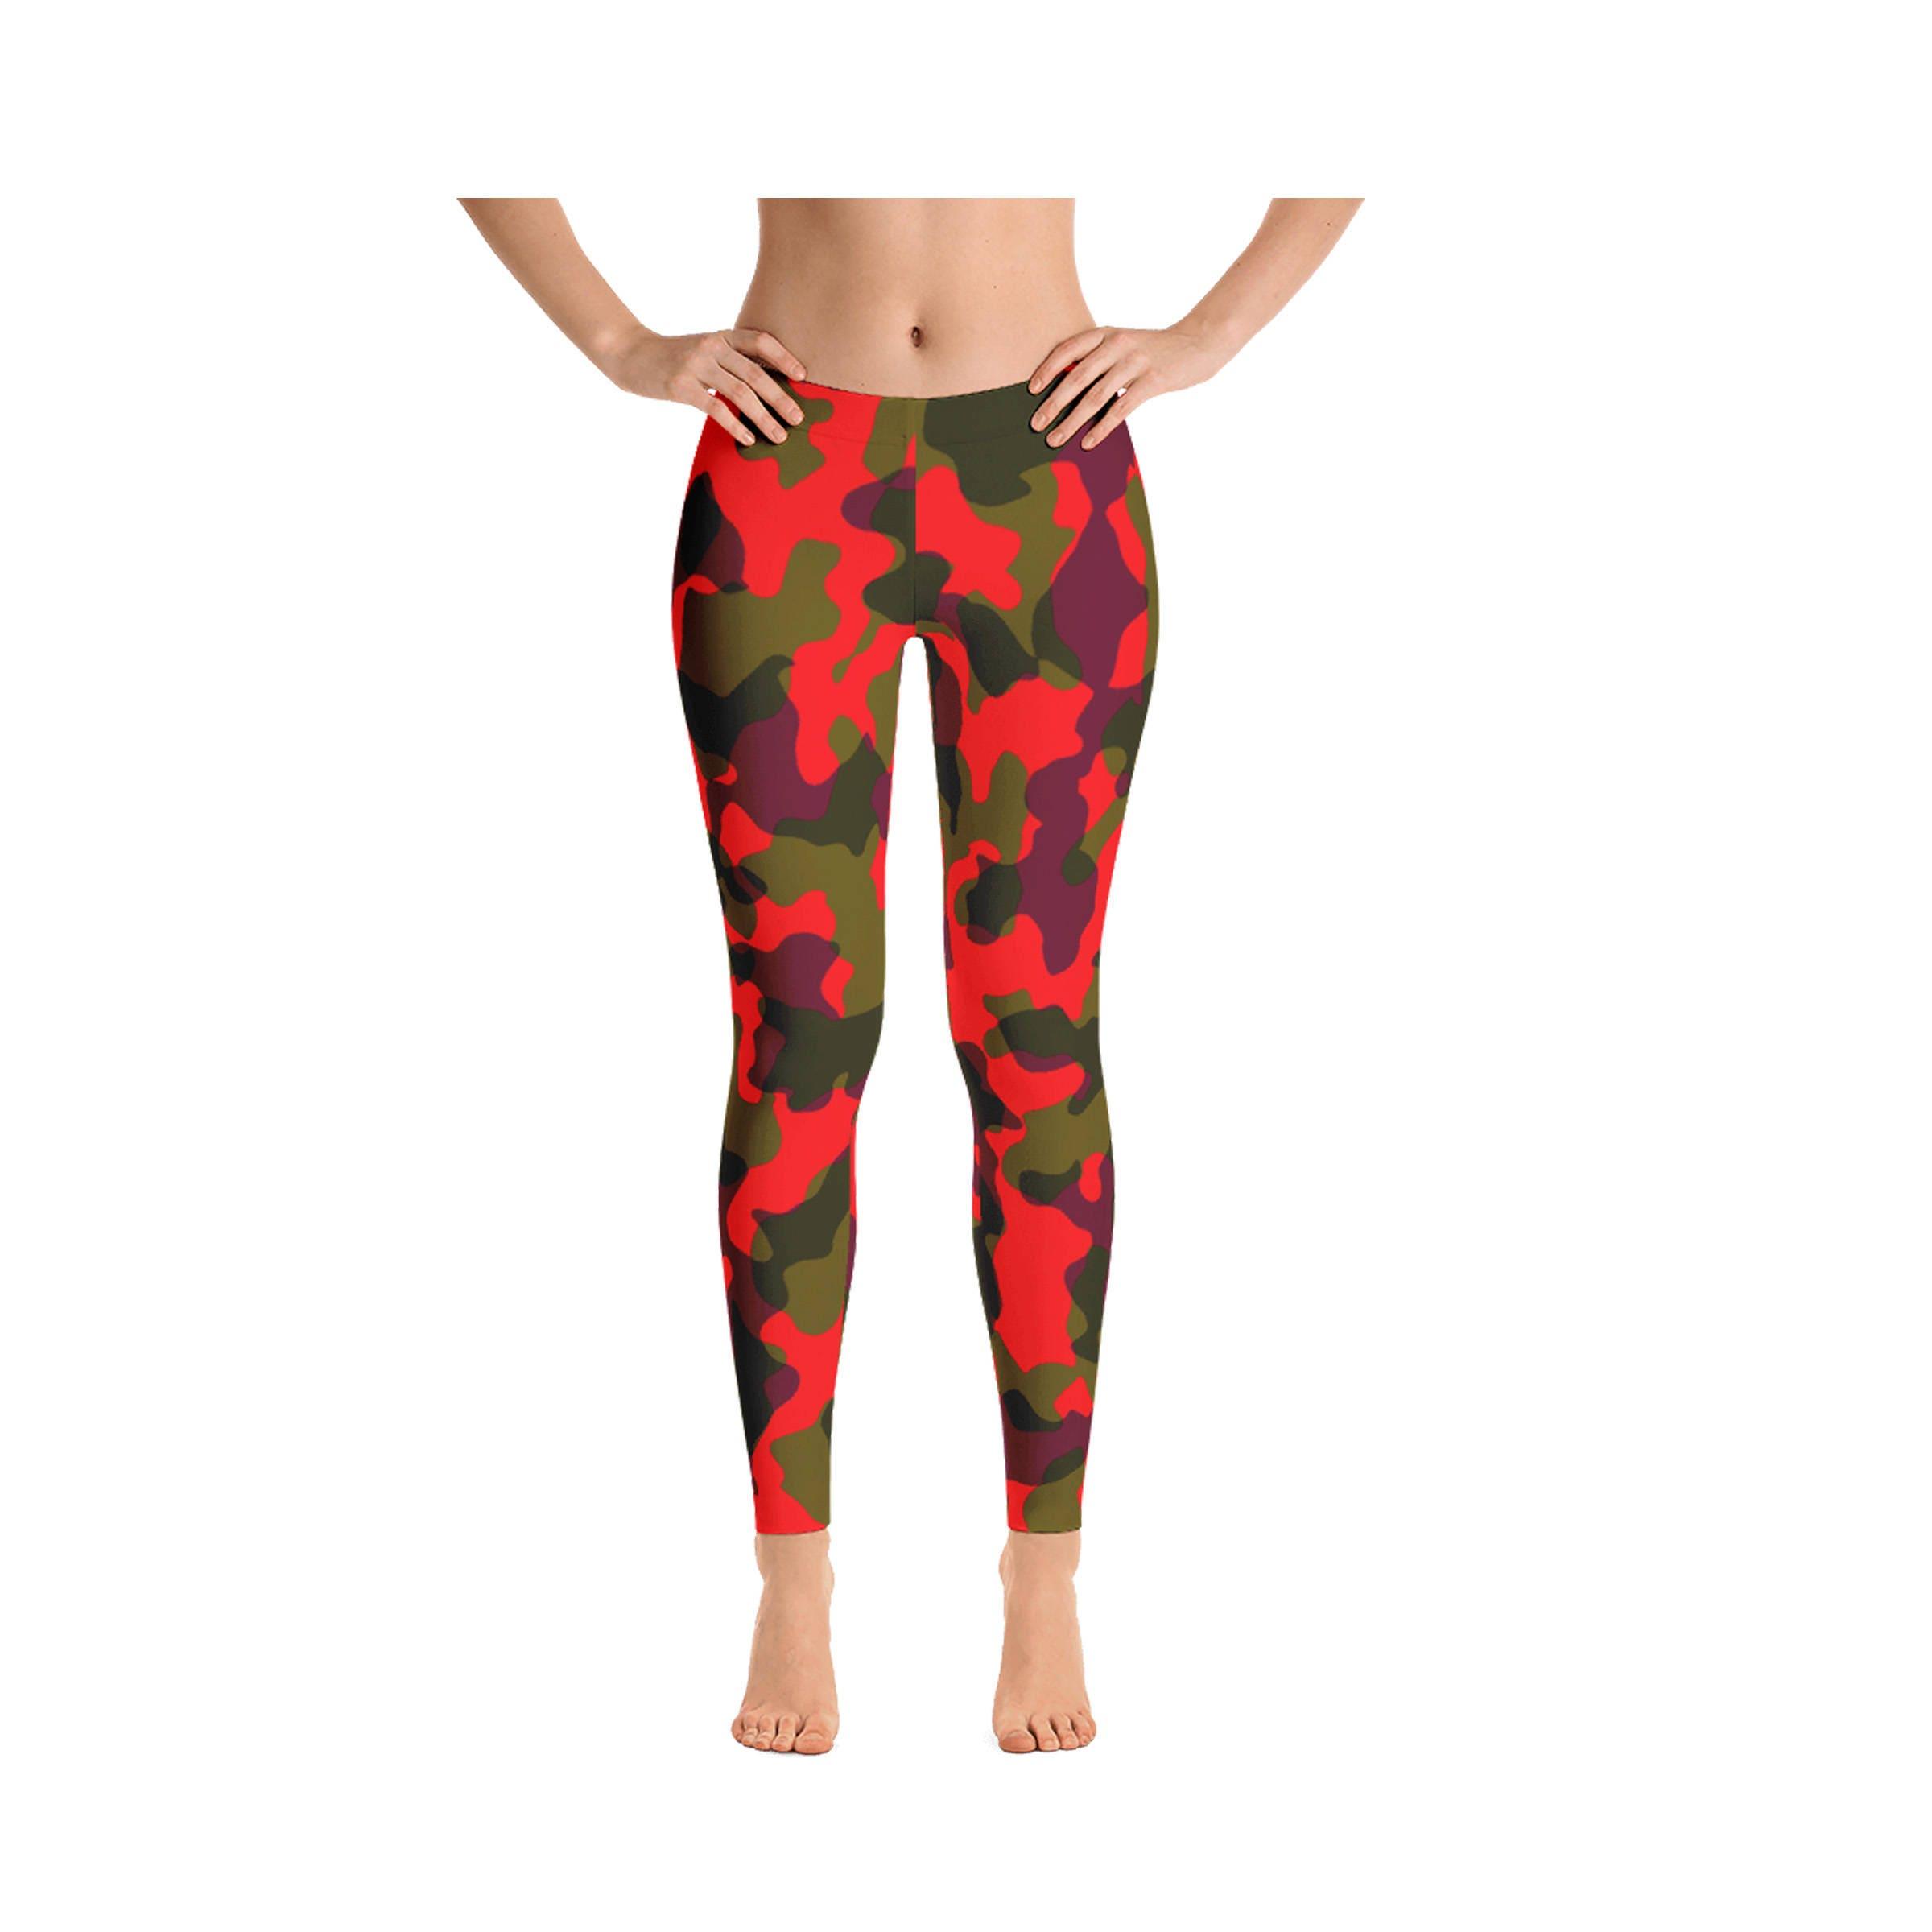 52c736006d4e32 Camouflage Leggings, Orange Green Purple Camo Leggings, Womens Adult Yoga  Pants Clothing, Camo Polyester Spandex Leggings XS S M L XL Size